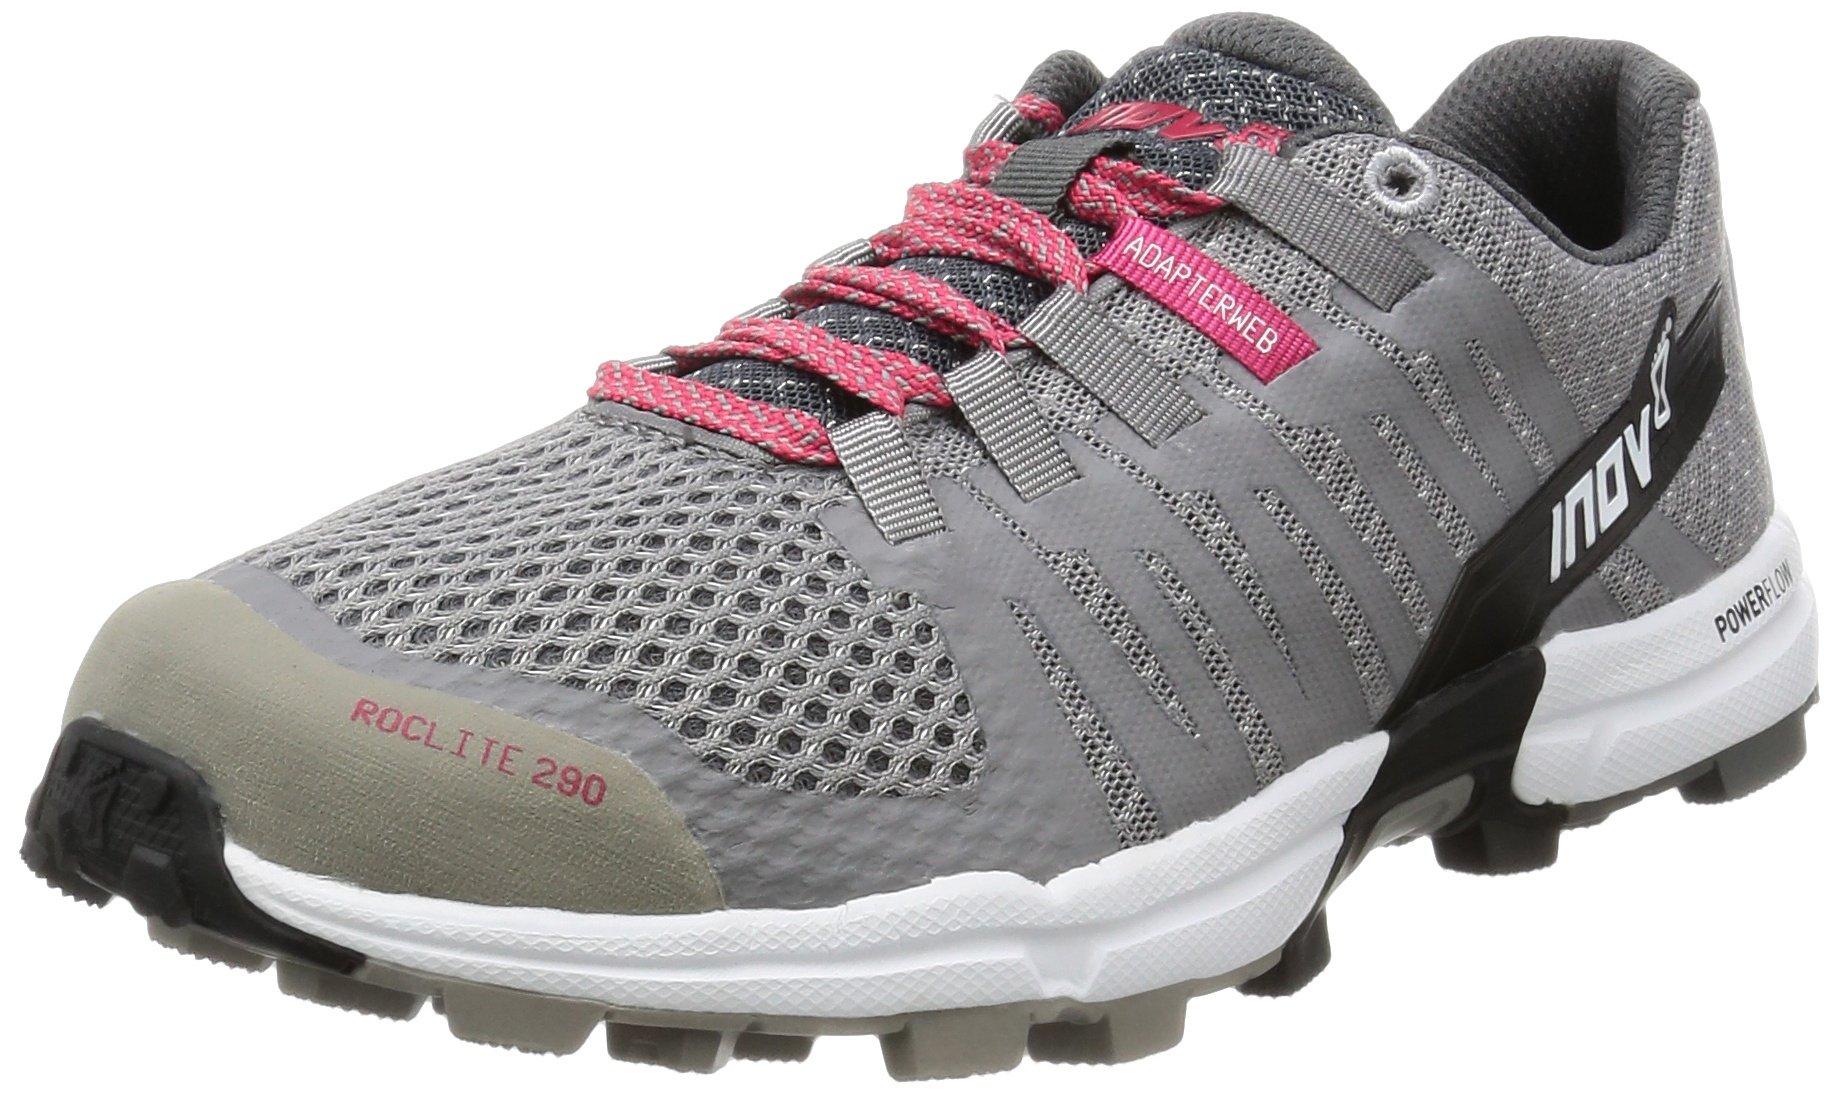 Inov-8 Women's Roclite 290 Trail Runner, Grey/Pink/White, 10 D US